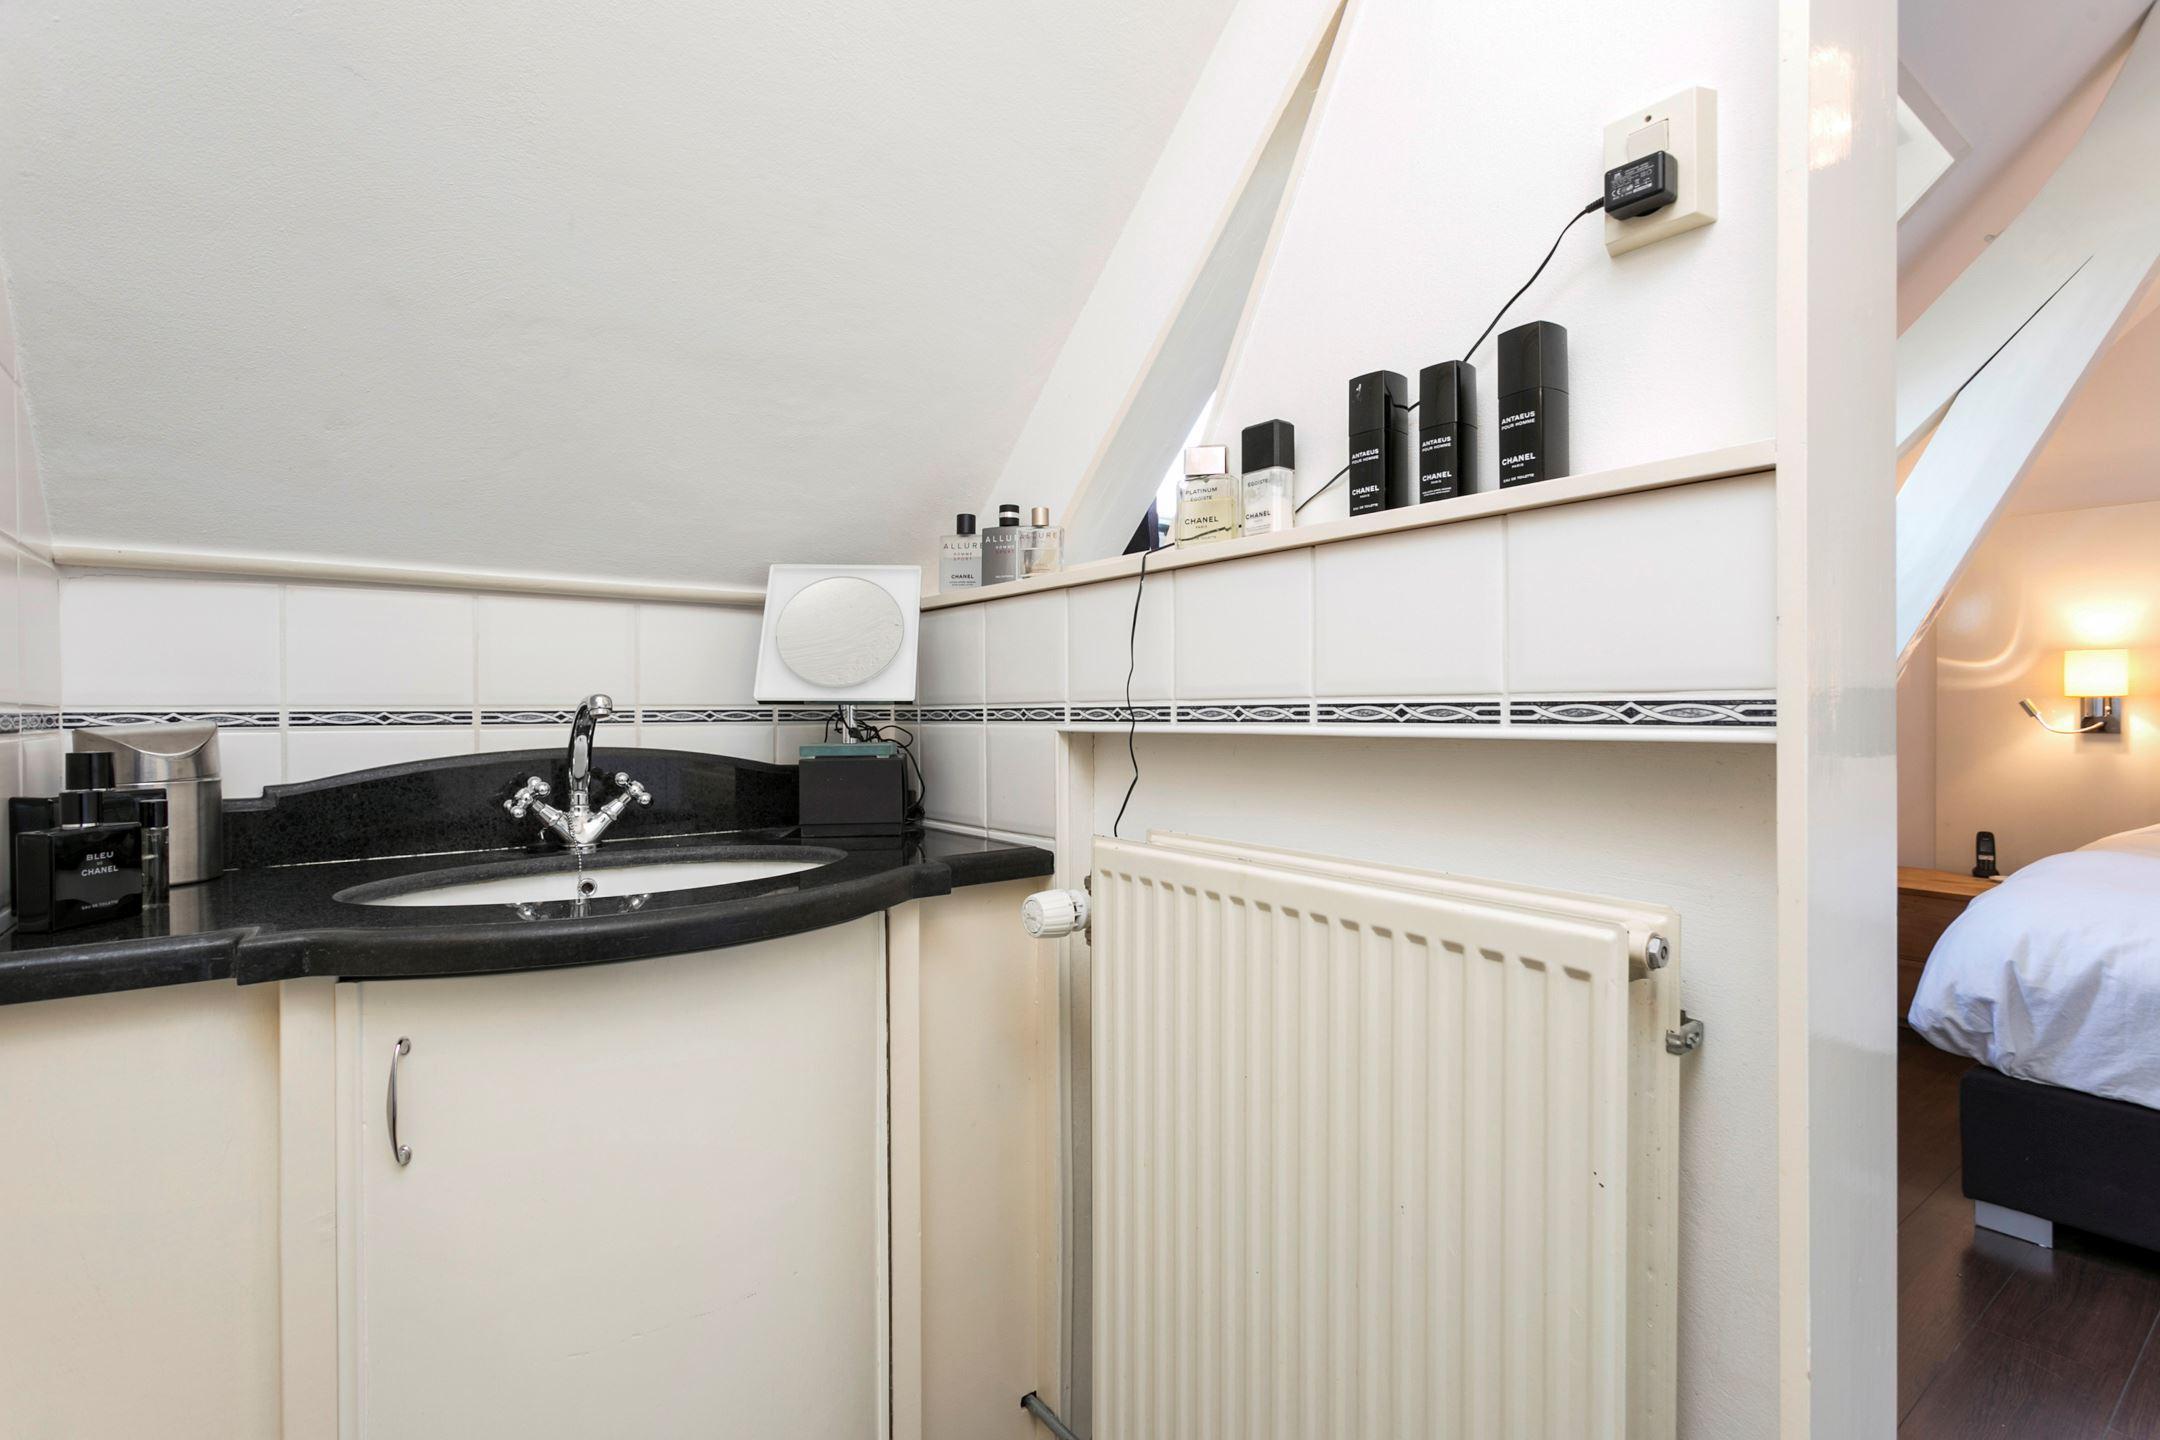 Plintverwarming Keuken Tips : Warmtelamp keuken kopen hoeve